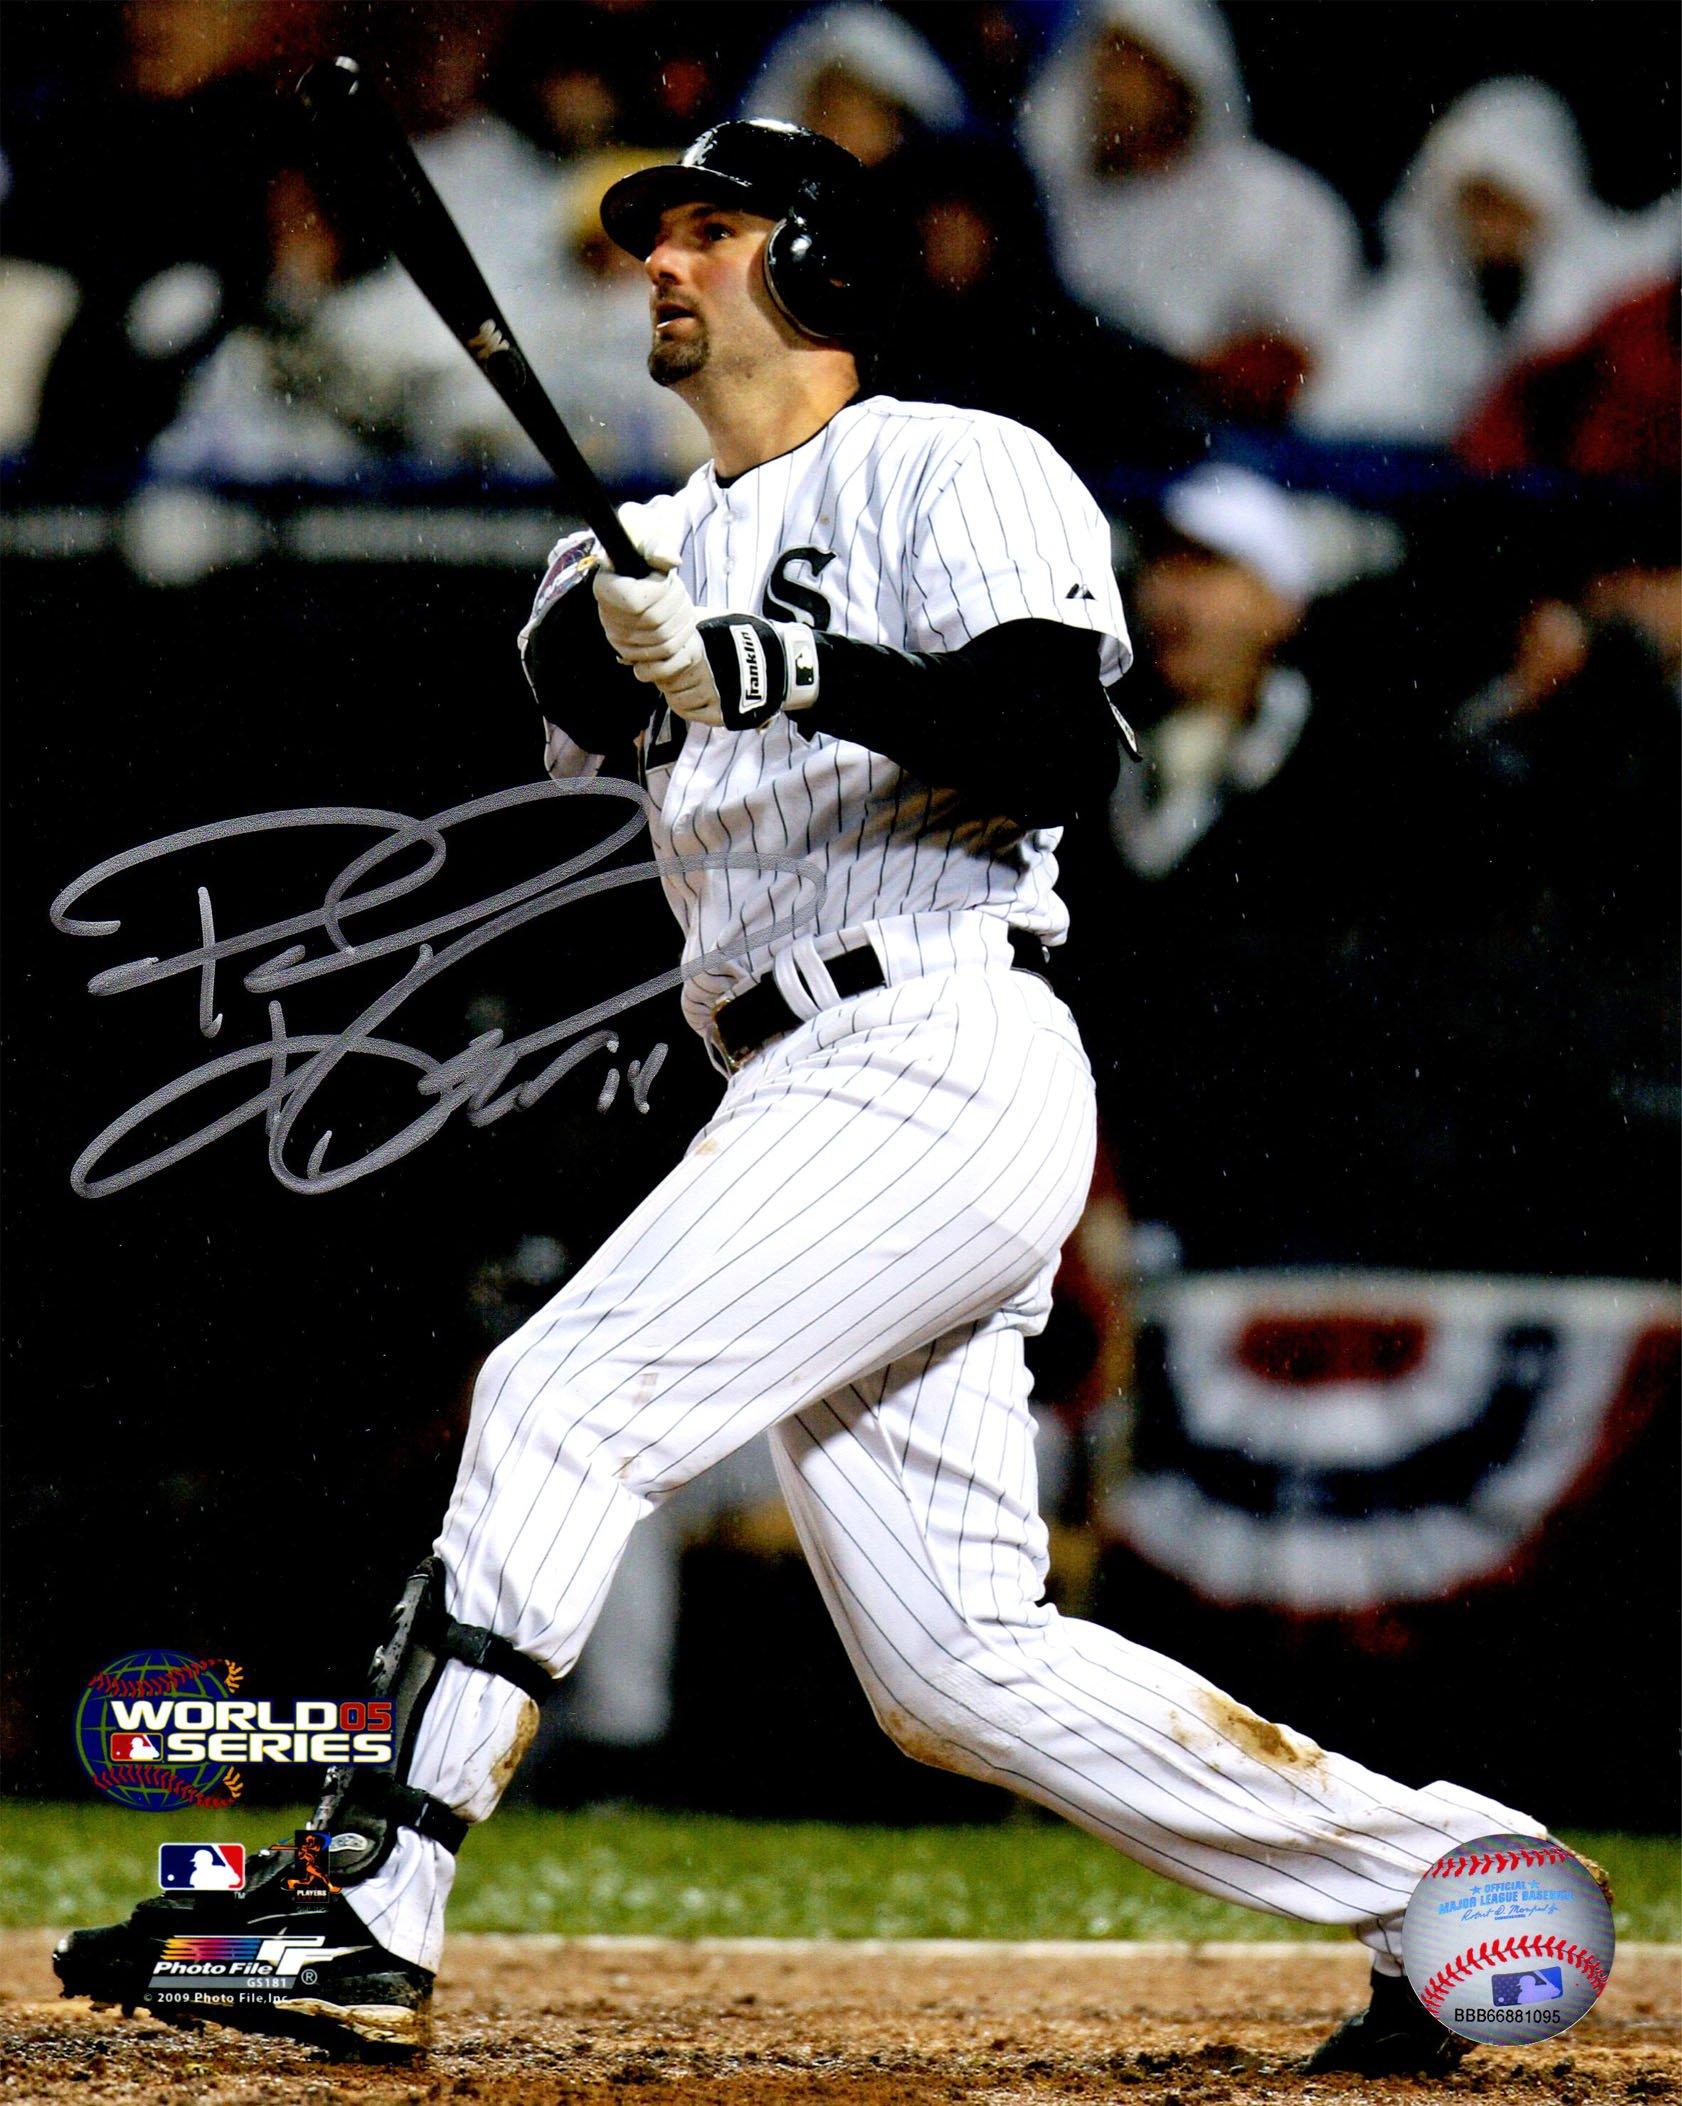 Paul Konerko Signed Chicago White Sox 2005 World Series Game 2 Gand Slam 8x10 Photo